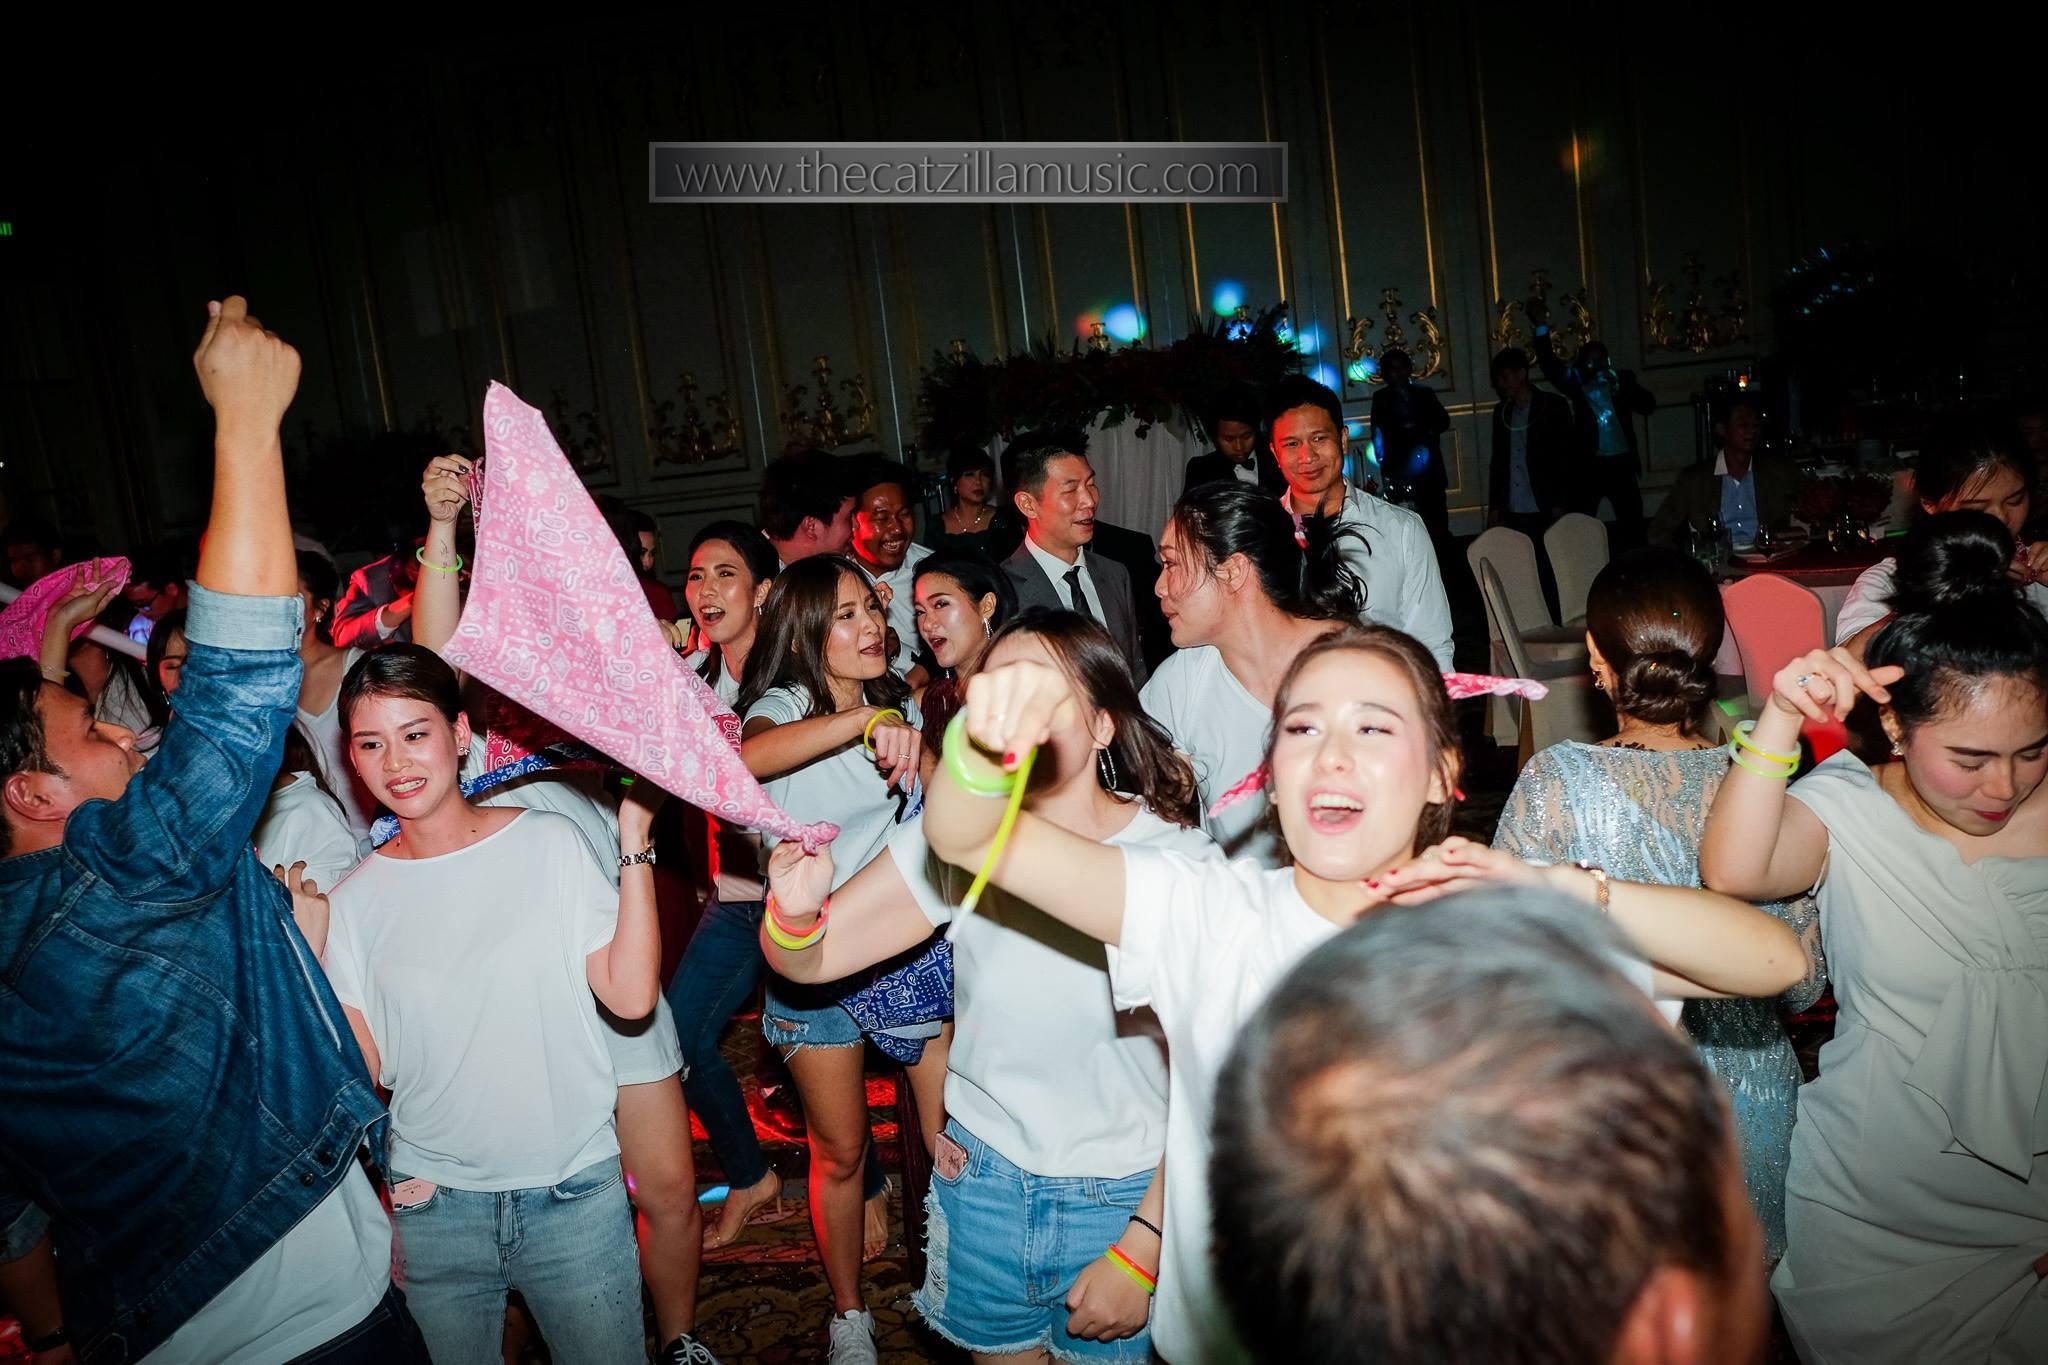 After-Party-Wedding-mandarin-oriental-bangkok-After Party งานแต่งงาน-วงดนตรีงานเลี้ยง-บุ๋นแบนด์-Catzilla